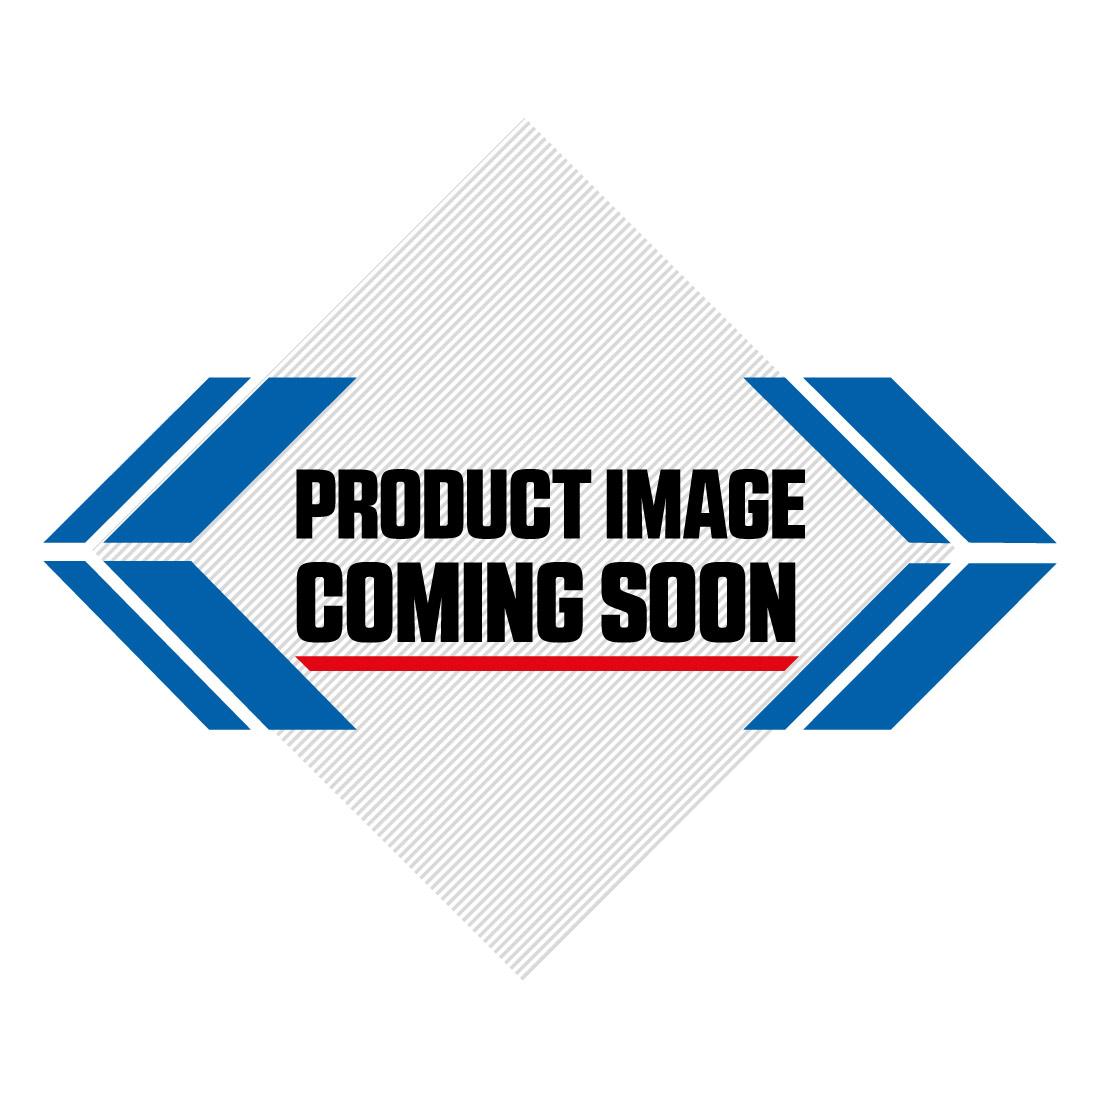 DJI Mavic Pro Platinum Drone Image-2